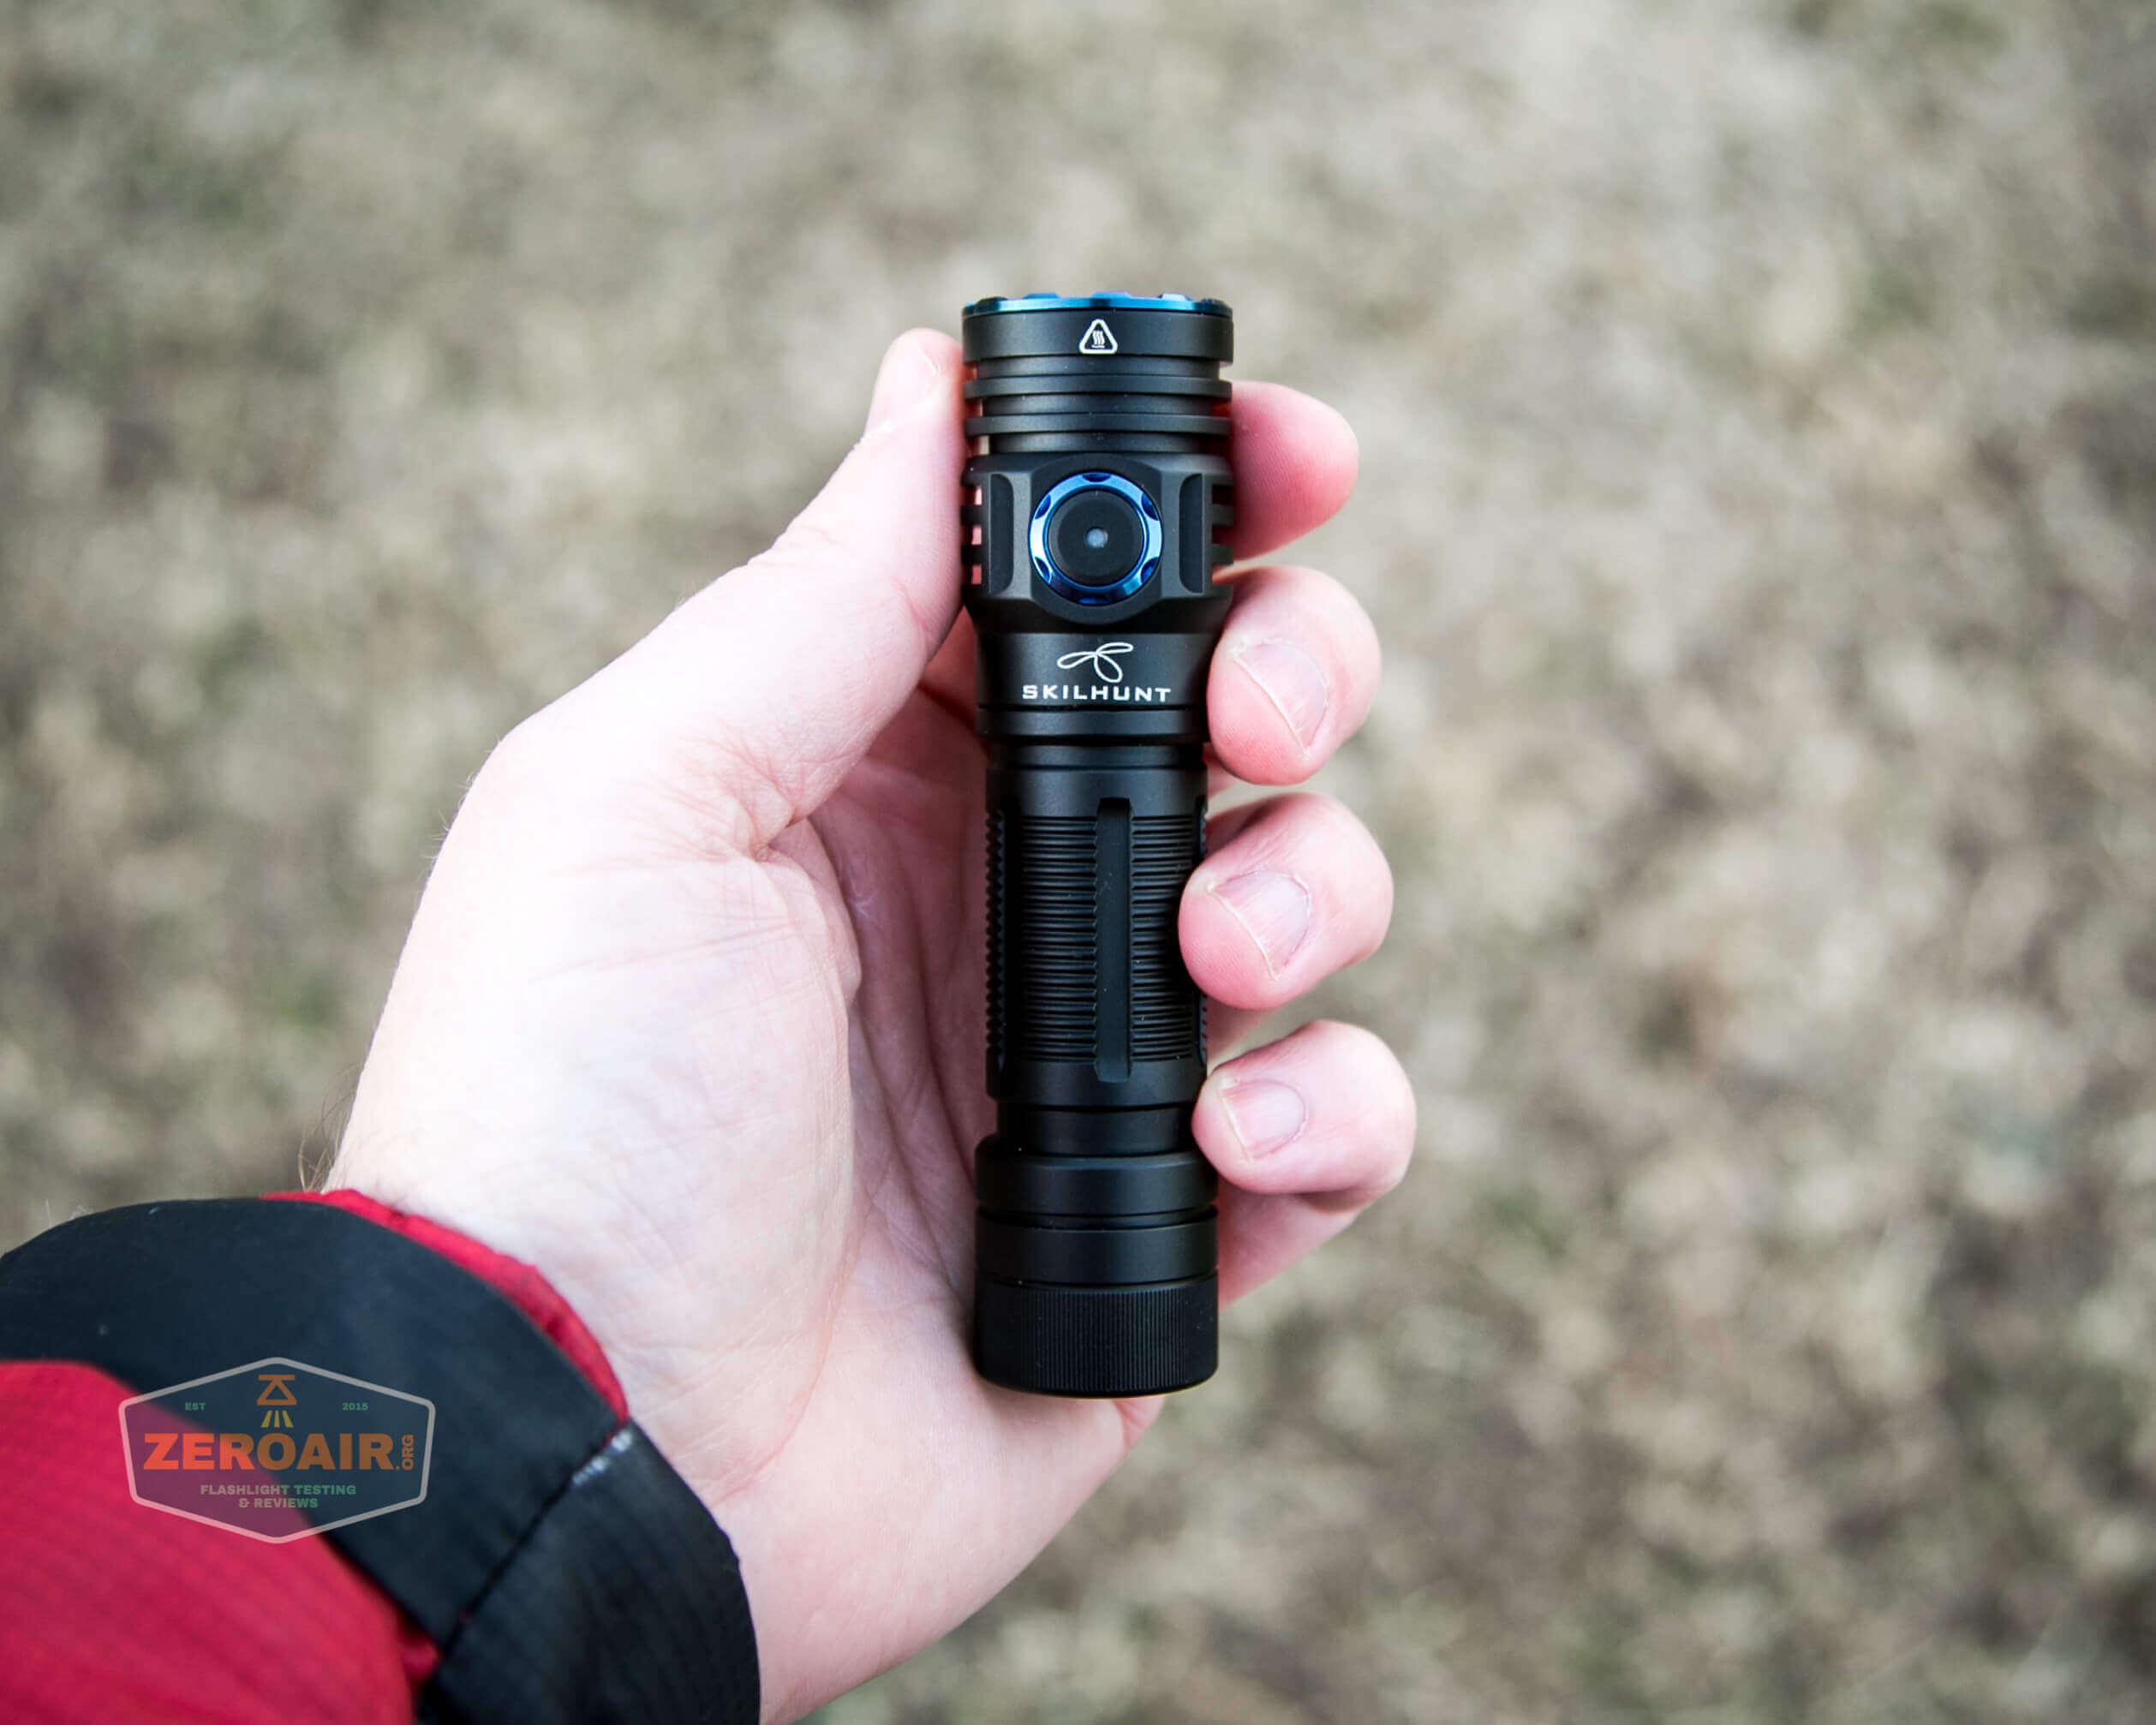 skilhunt m300 18650 flashlight in hand